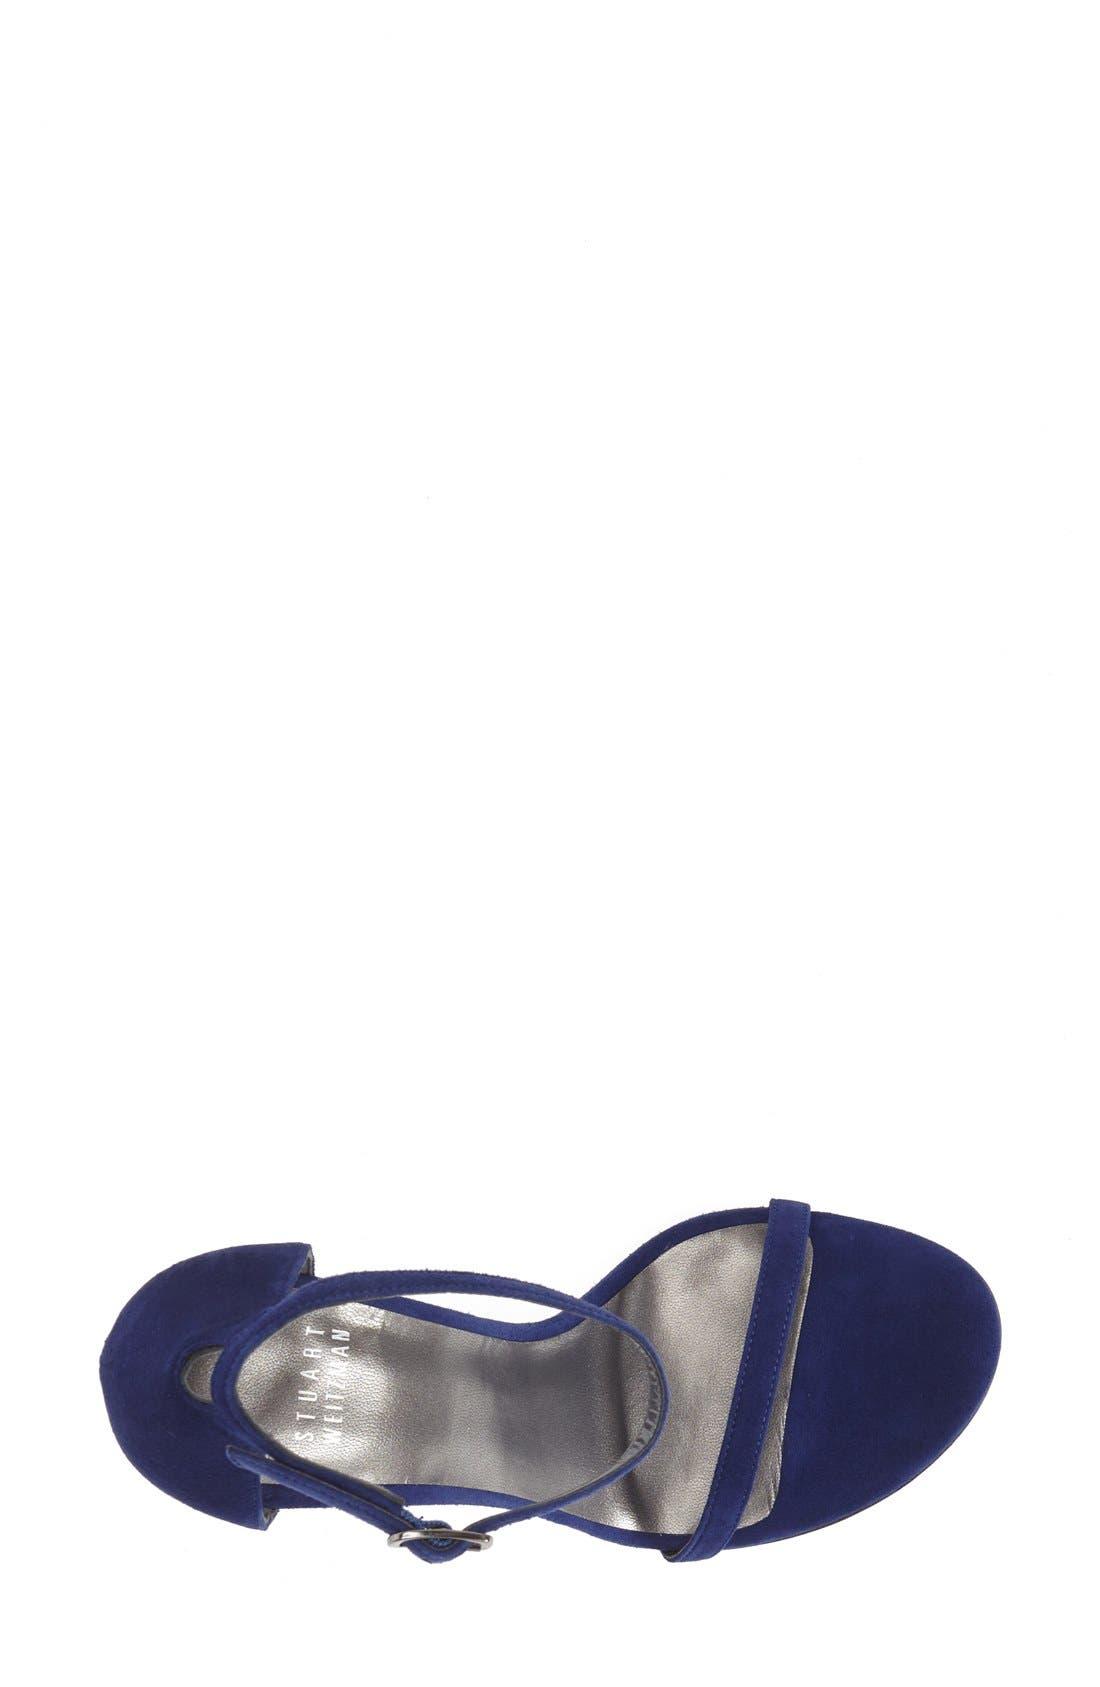 Nudistsong Ankle Strap Sandal,                             Alternate thumbnail 113, color,